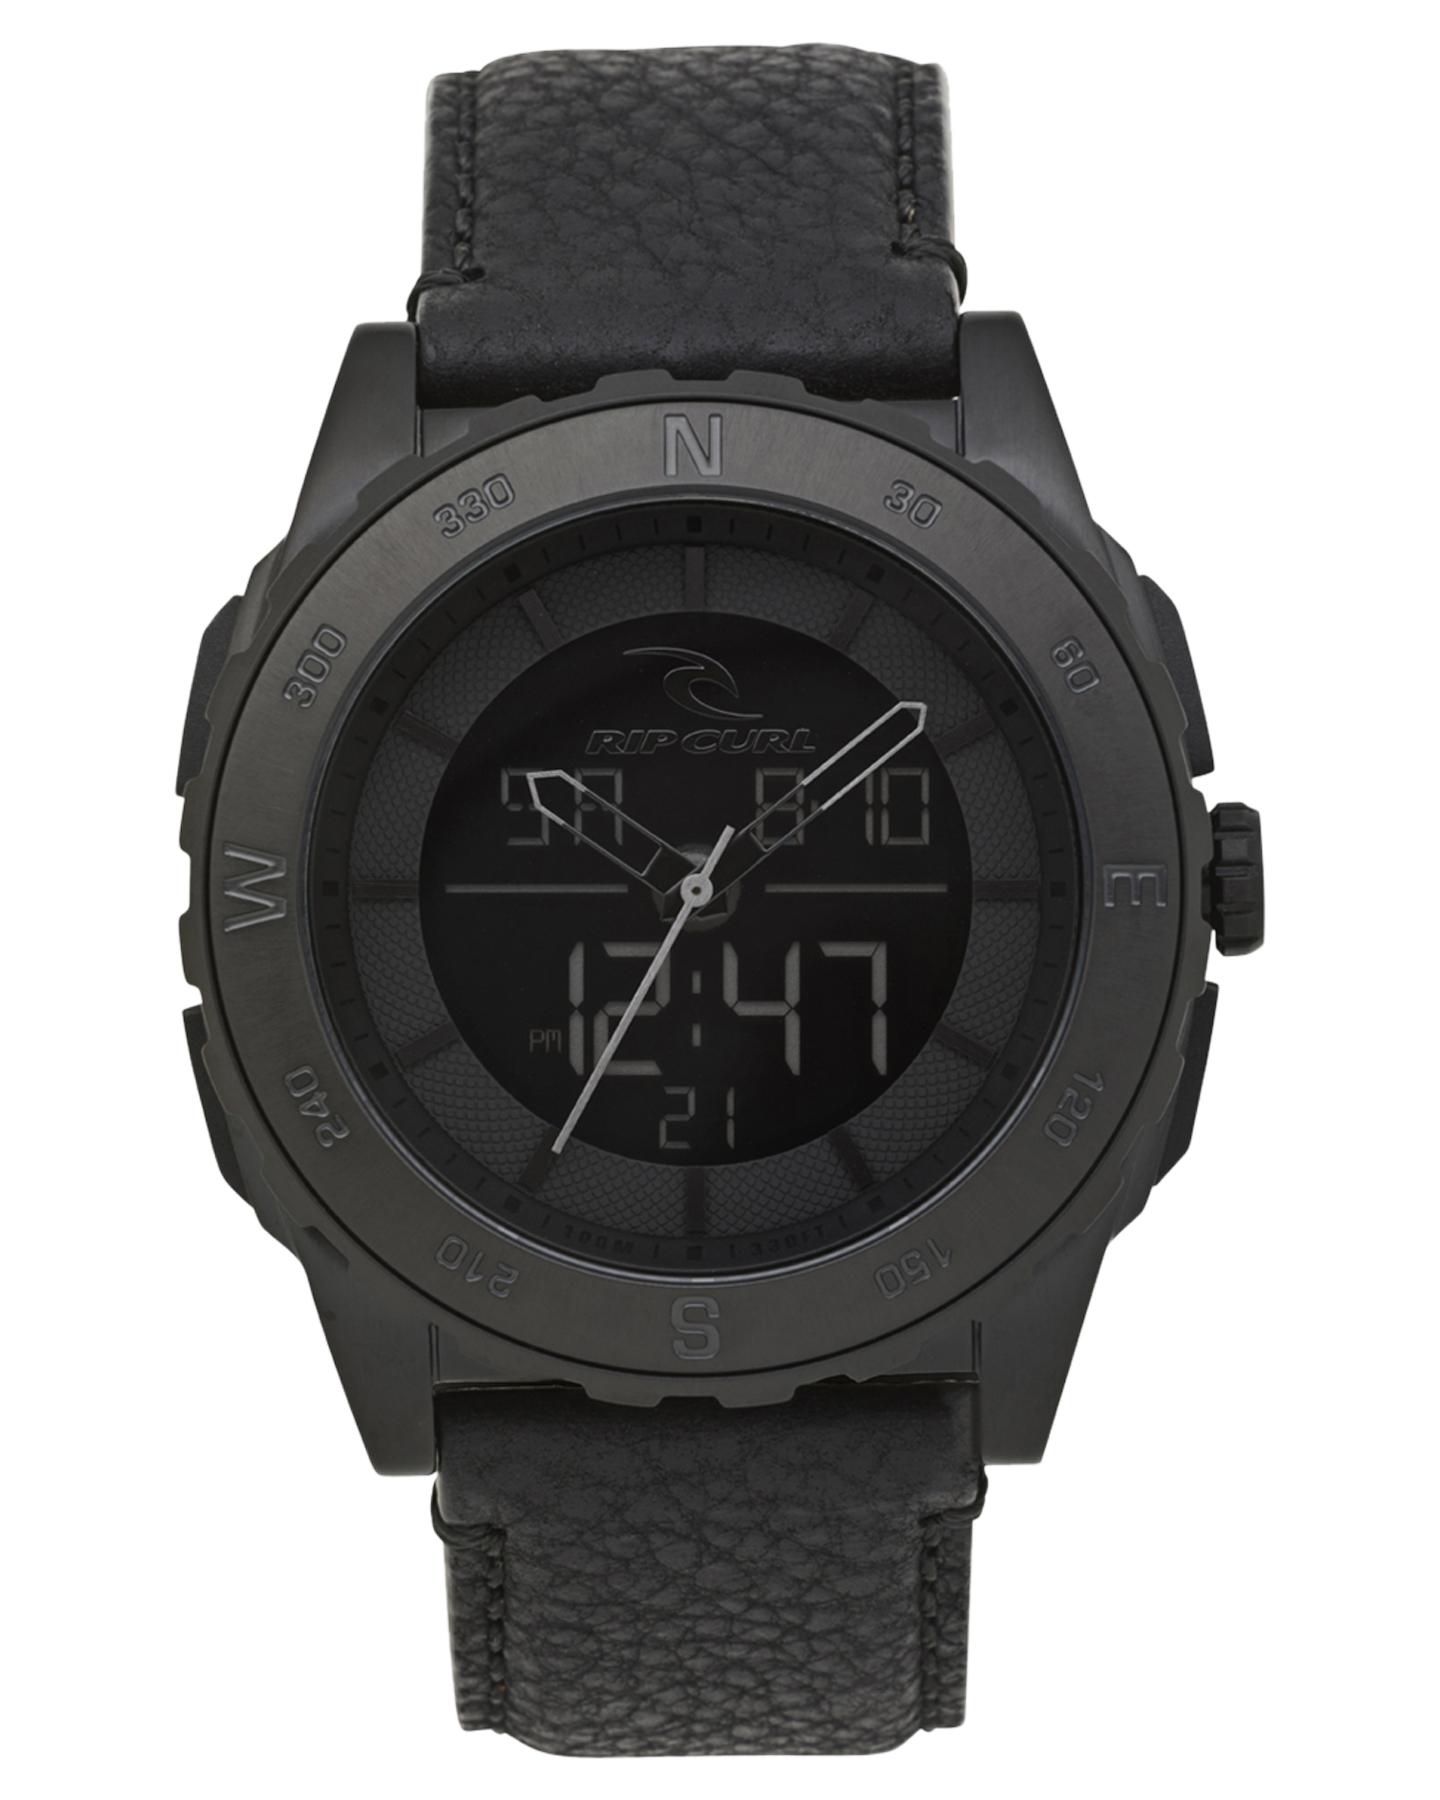 Rip Curl Rival Ana-Digital Lthr Watch Blackout